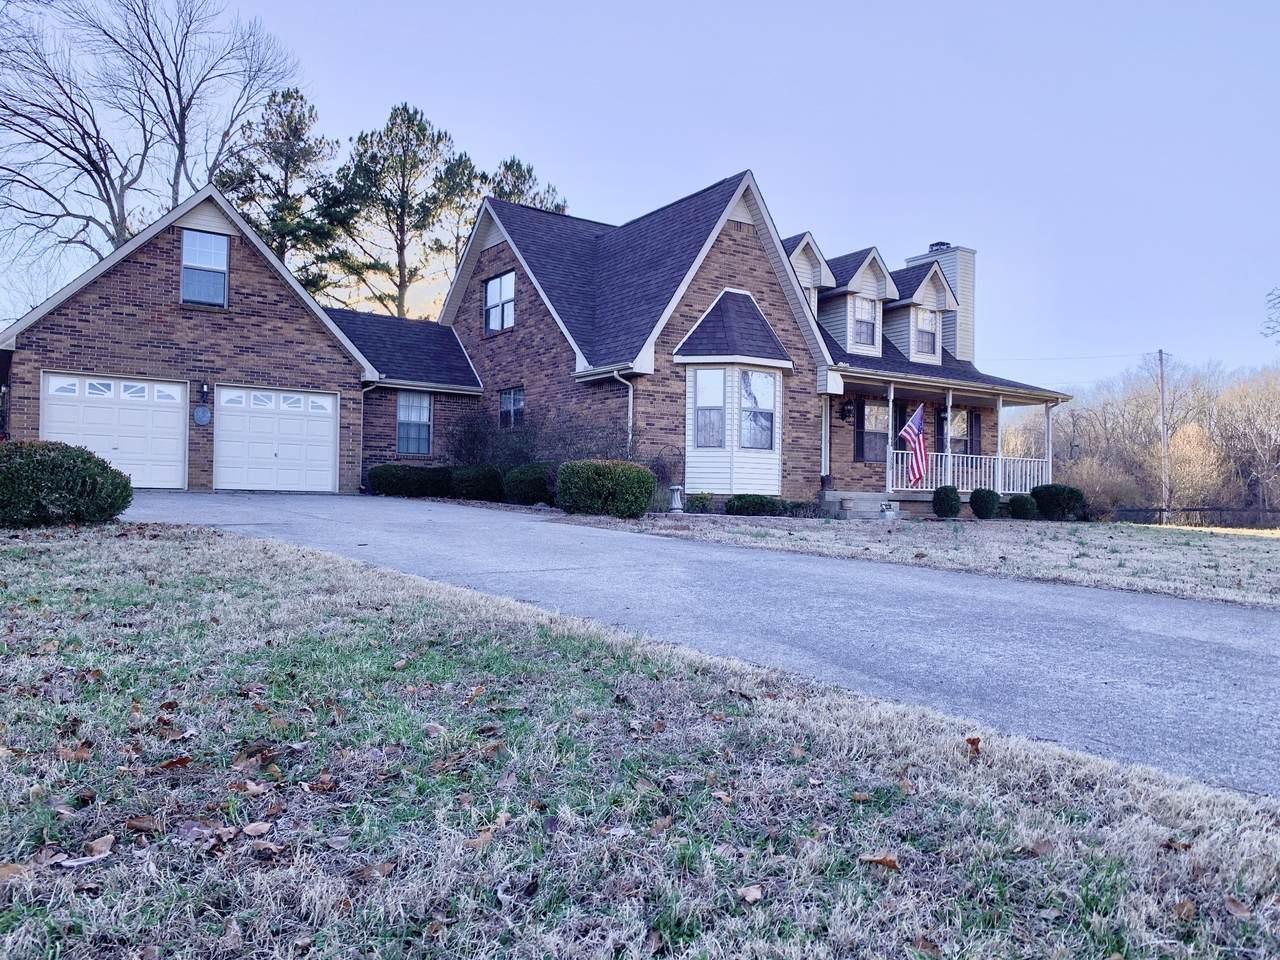 1330 Garrettsburg Rd - Photo 1